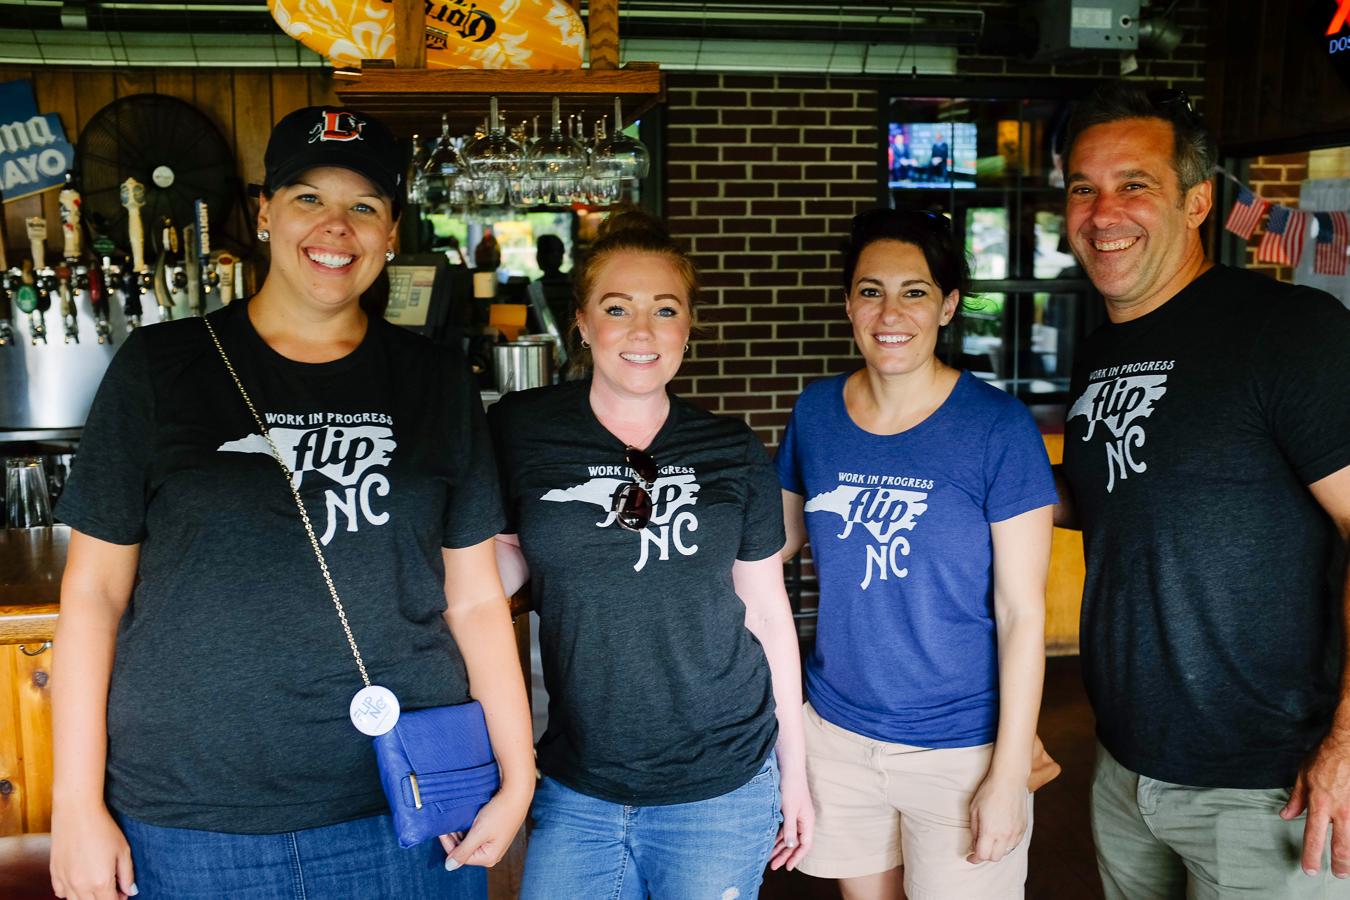 Andrea (left) with fellow FLIPsters Liz Wardzinski, Amy Cox, and Pat Bayer